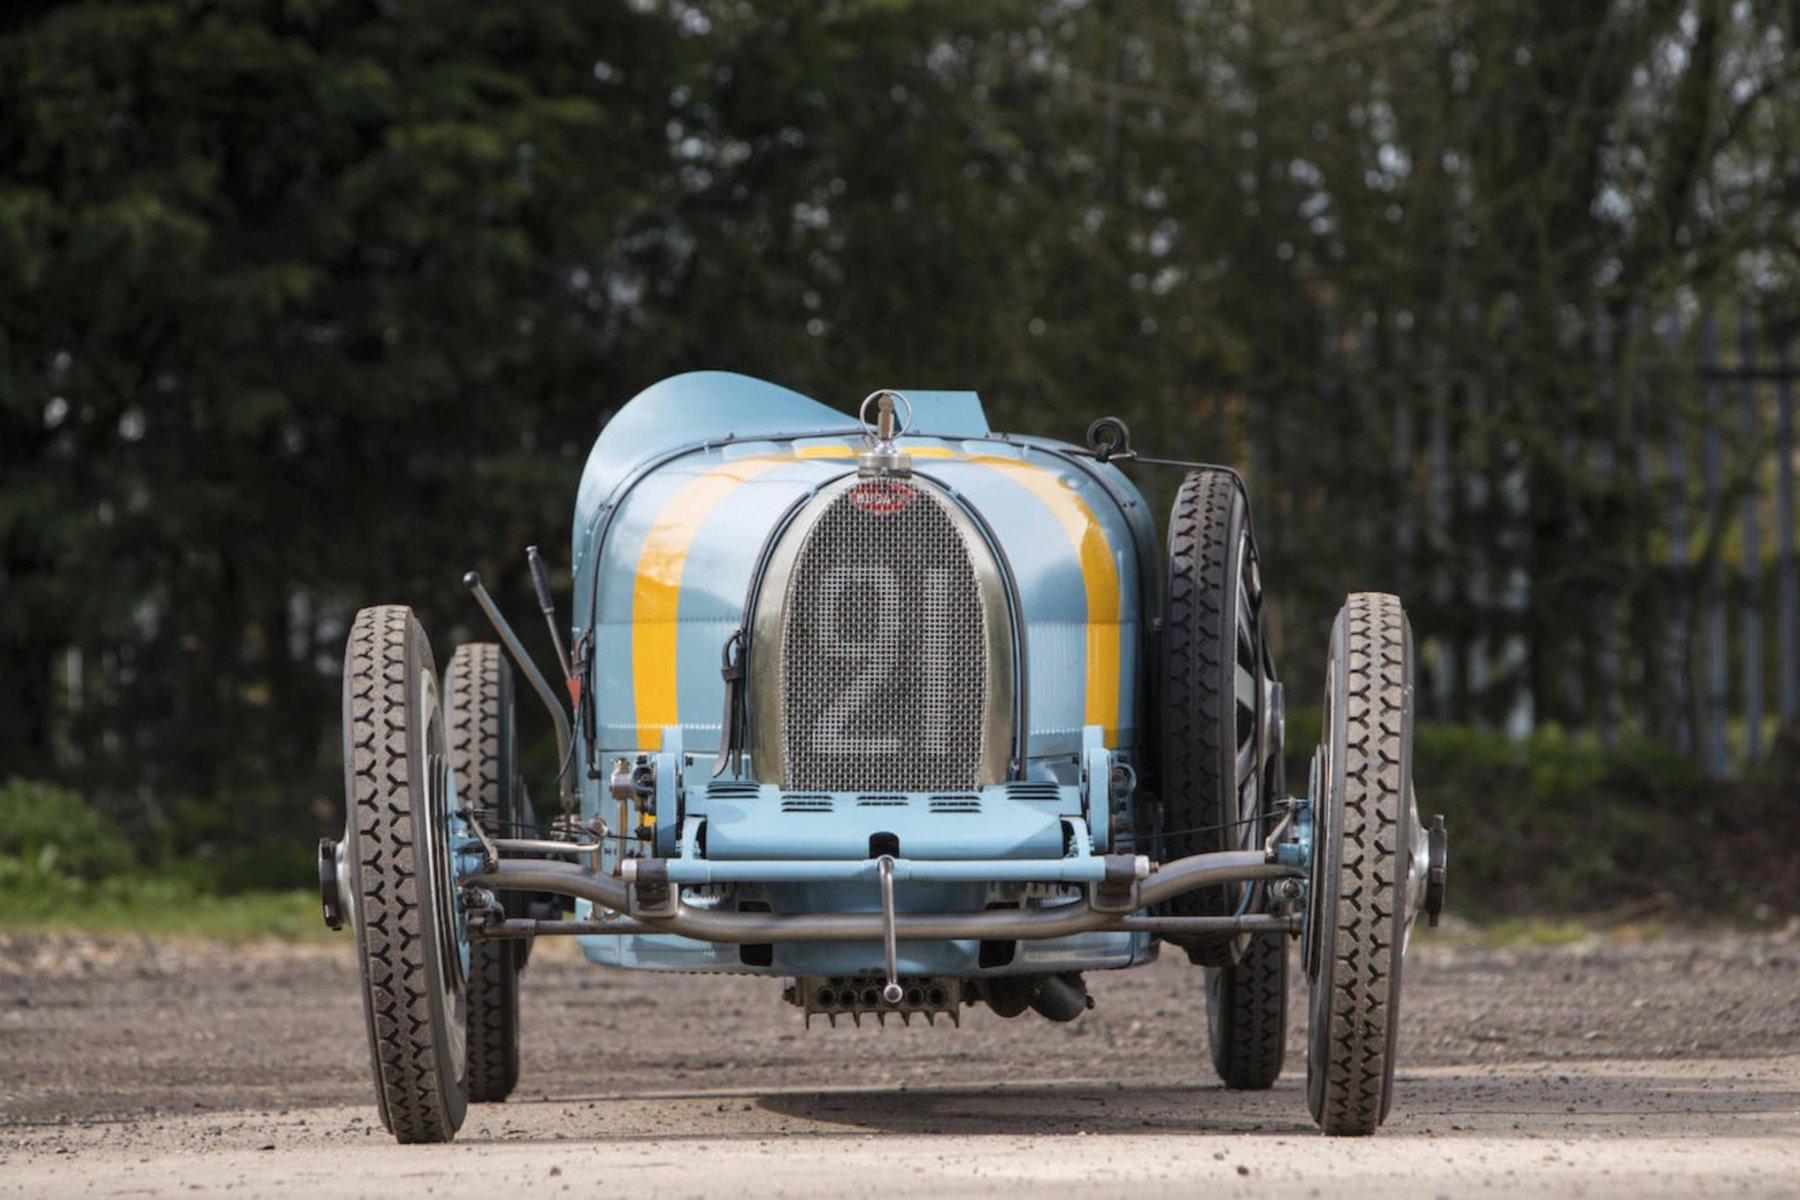 The Bugatti Type 35 race car